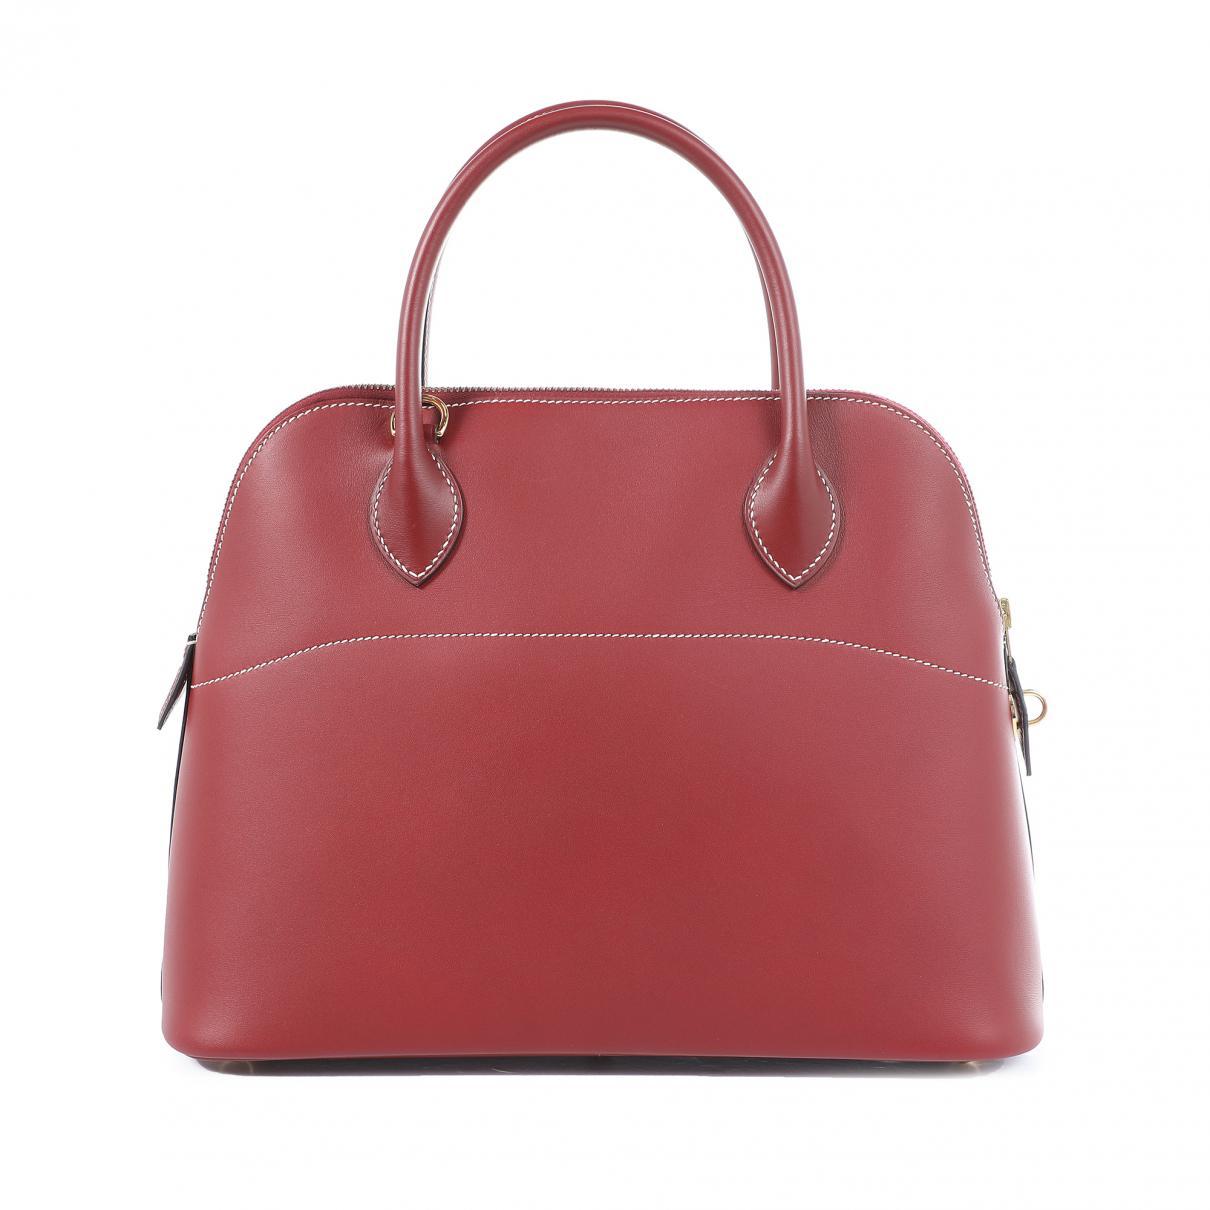 b1f952f9fb53 Hermès Bolide Leather Bag in Red - Lyst